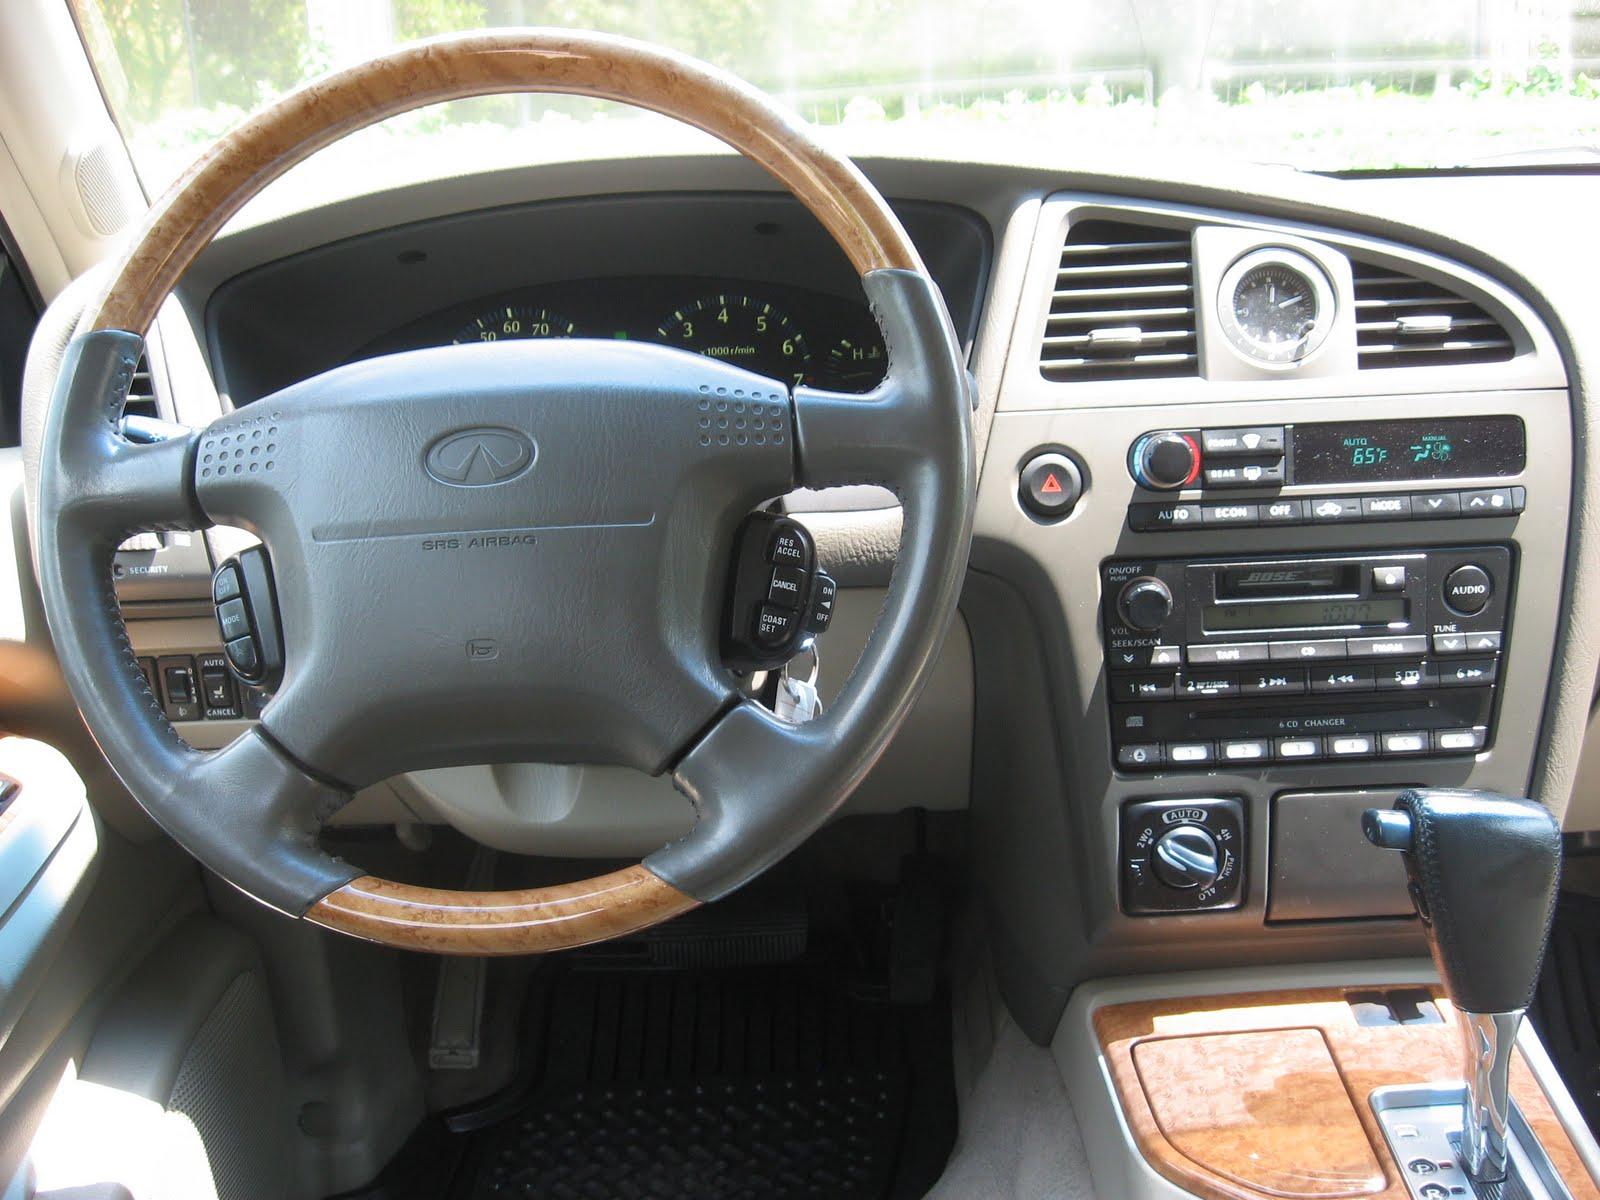 Steering Wheel From Qx4 In Pathfinder Nissan Forum